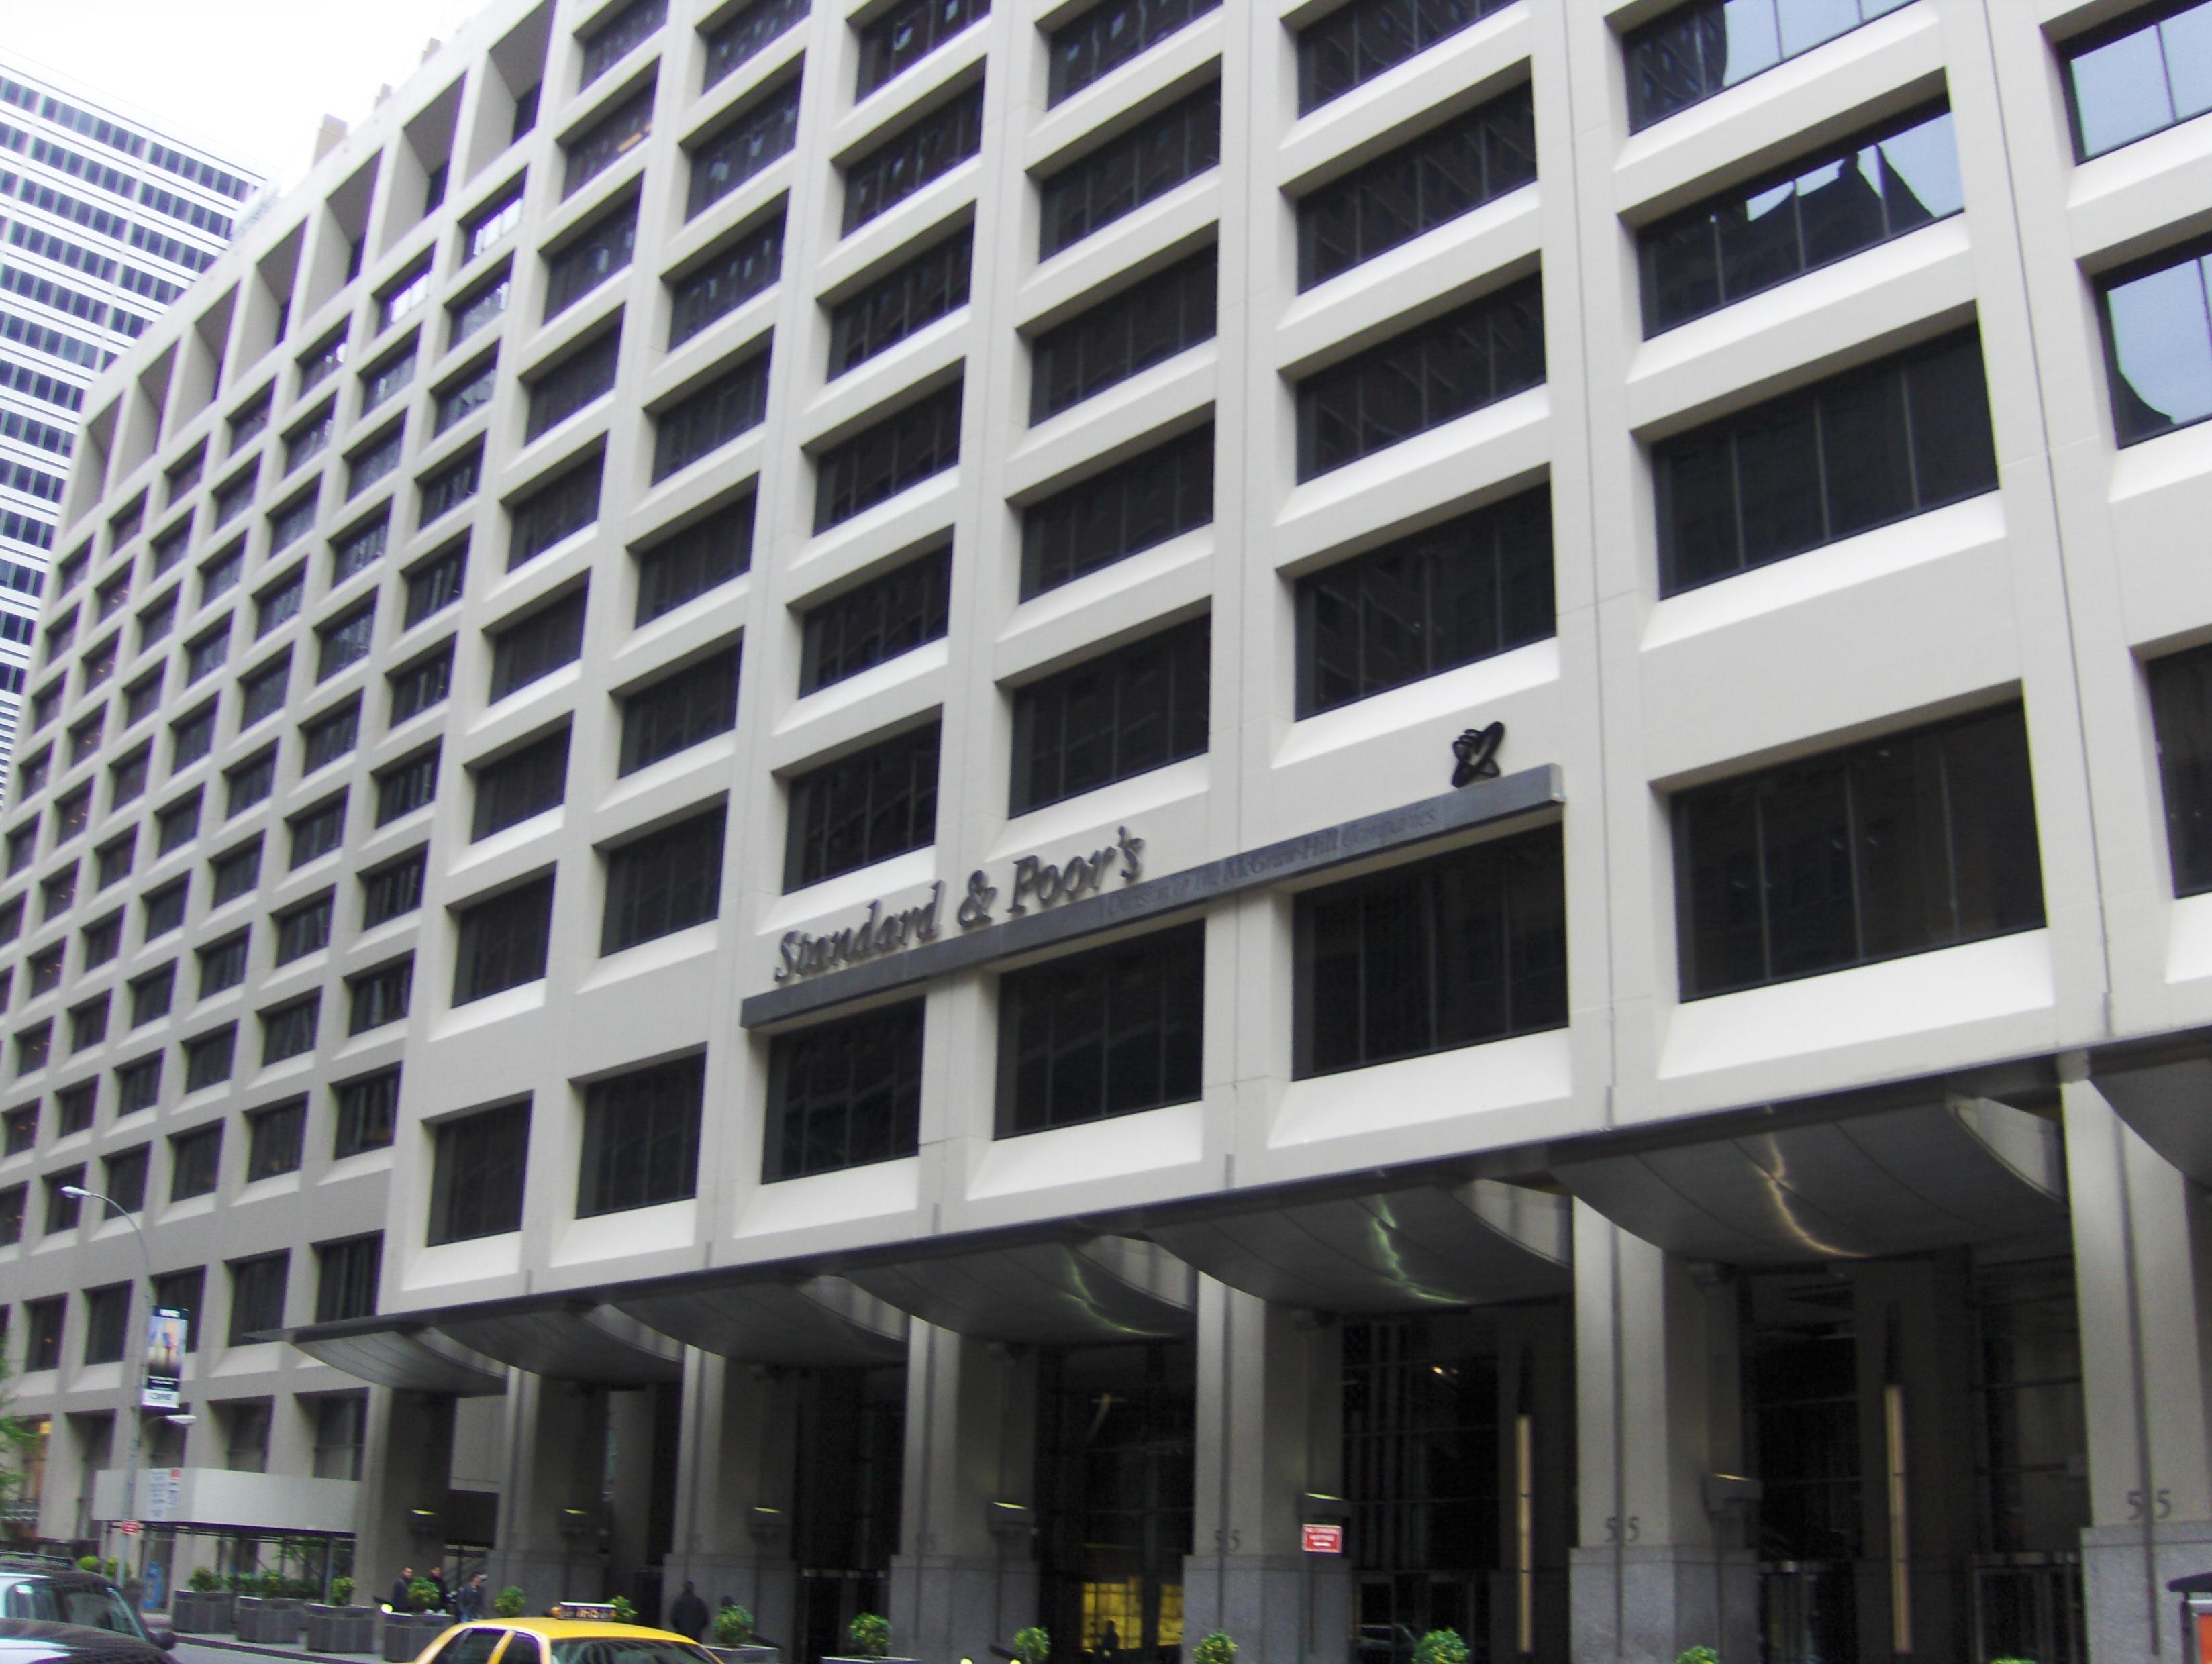 MEPs agree credit rating agency crackdown